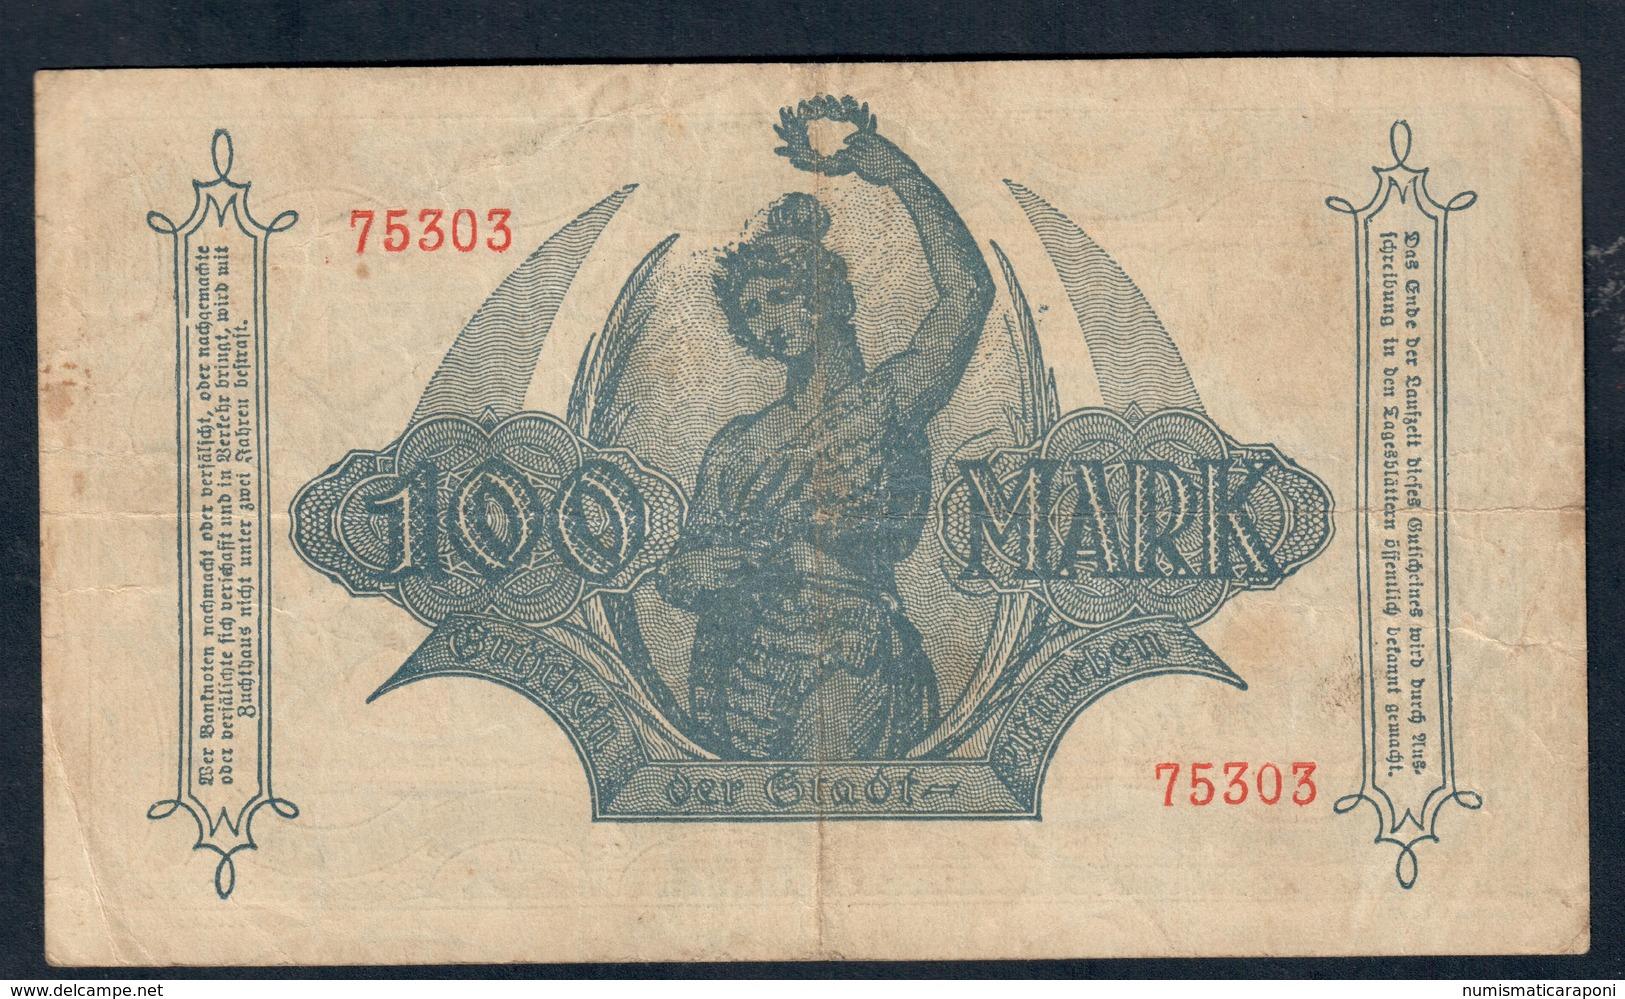 GERMANIA ALEMANIA GERMANY Notgeld Munchen 100 Mark 1922 Lotto 085 - 1918-1933: Weimarer Republik